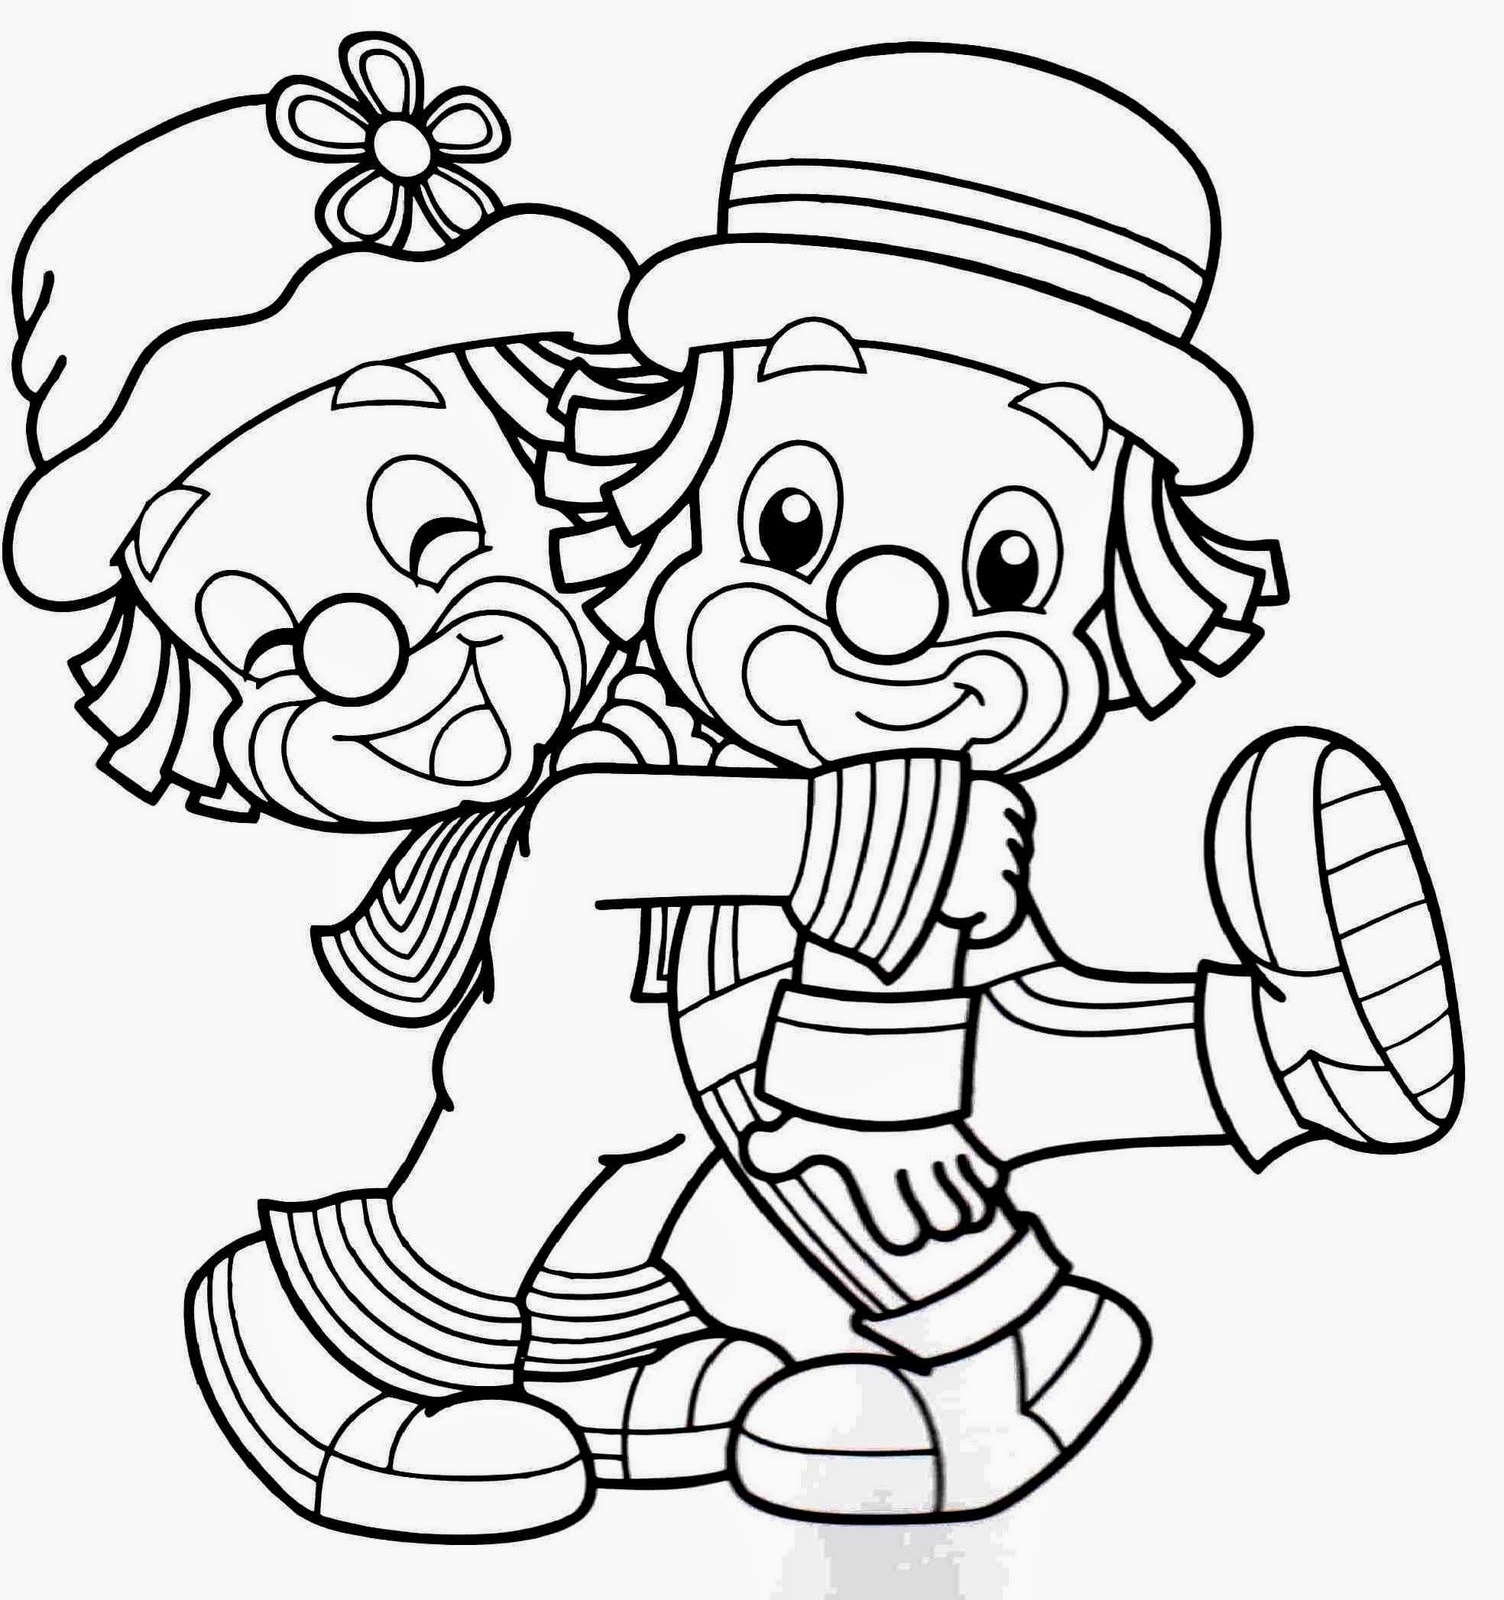 desenhos patati patatá para colorir desenhos para colorir